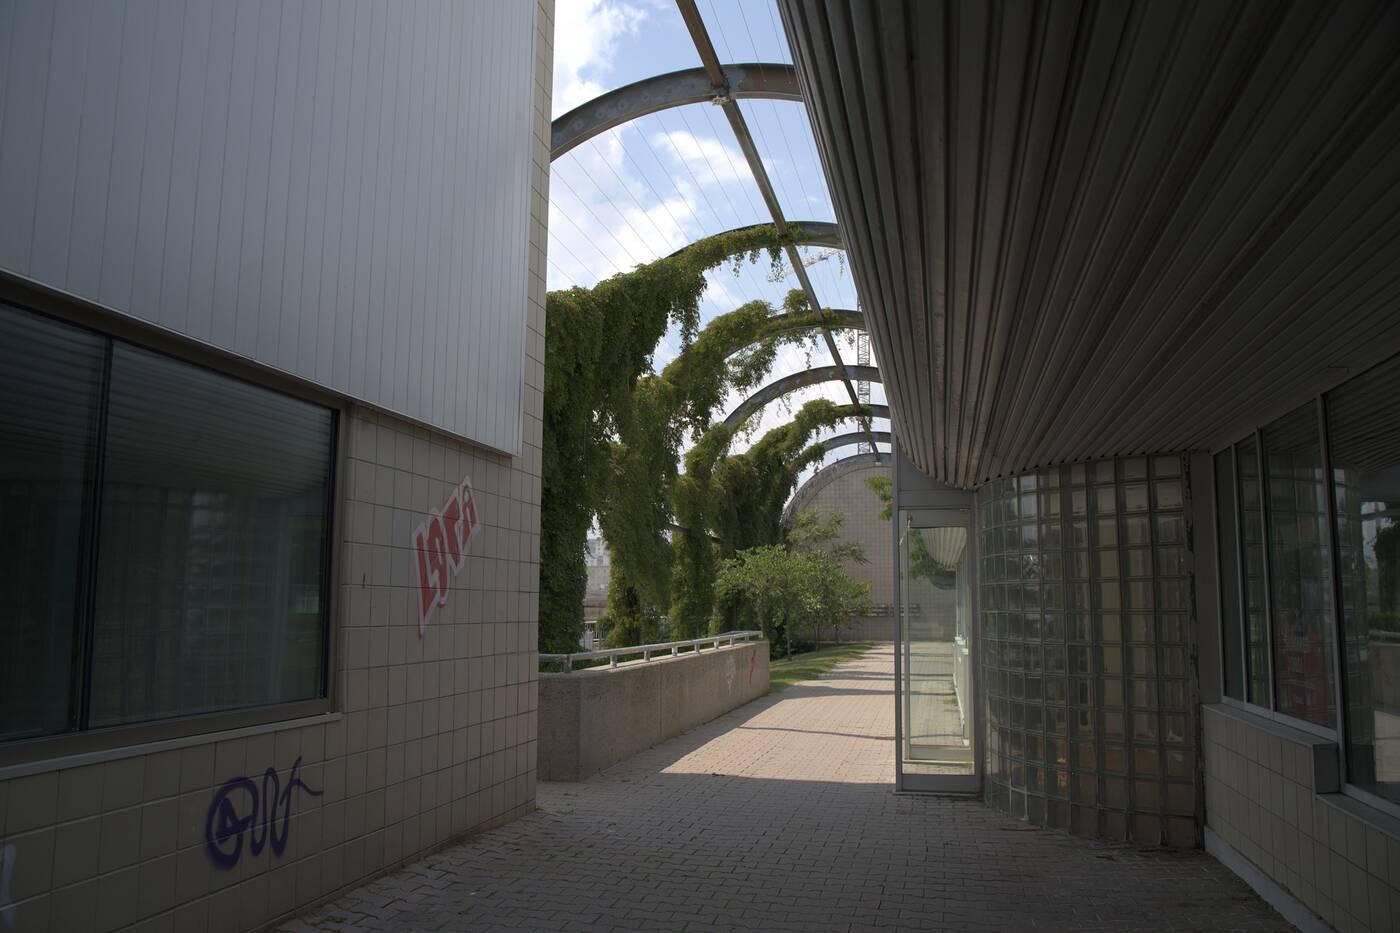 Wallace emerson community centre